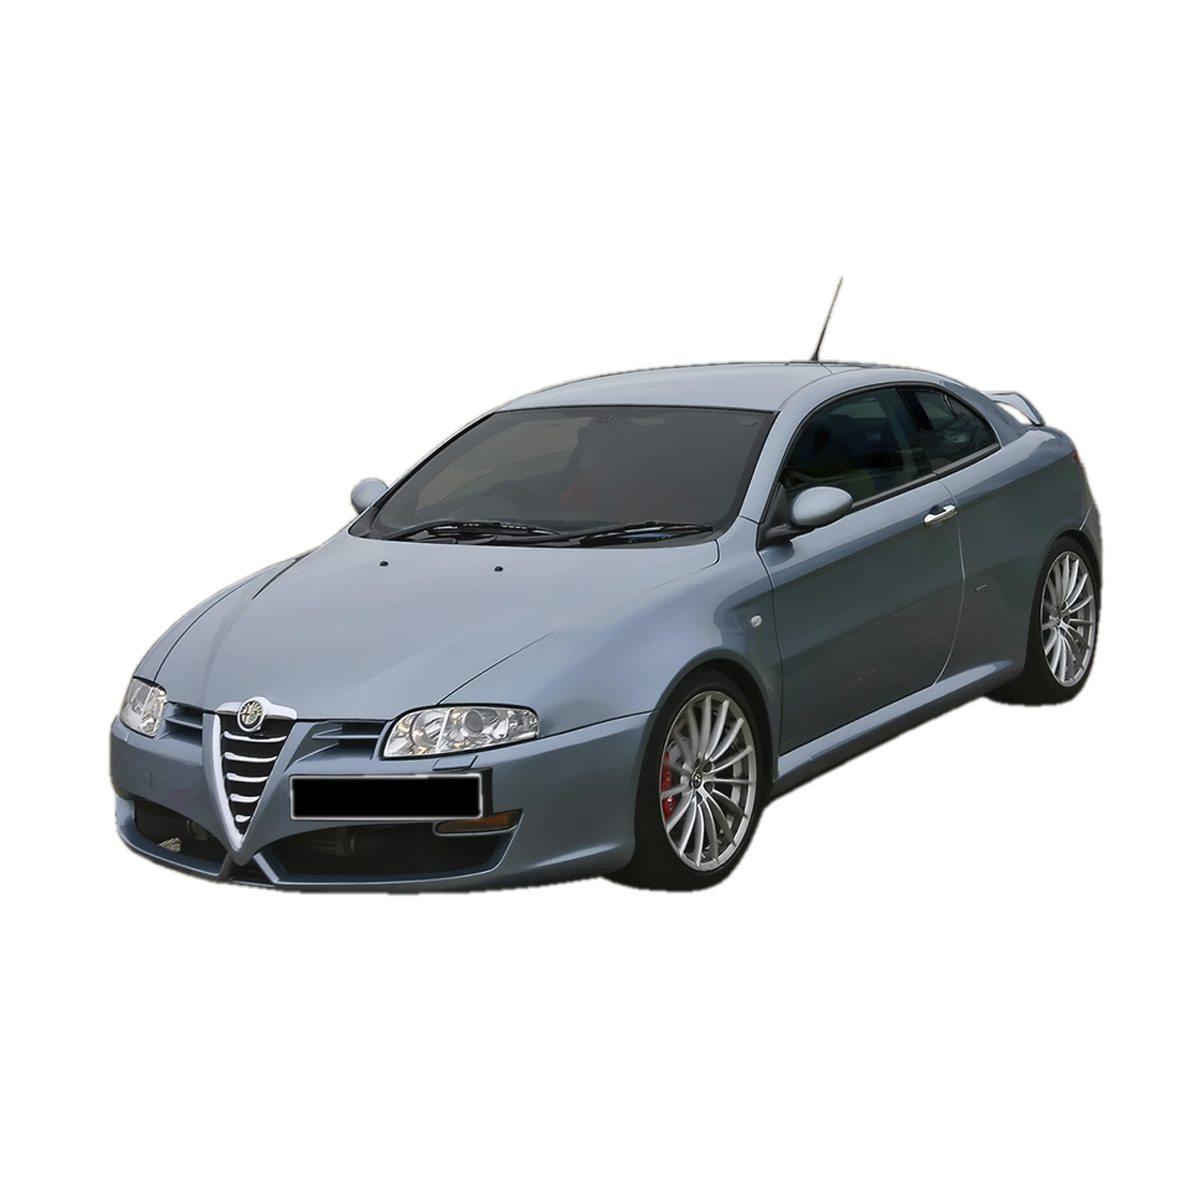 Alfa-Romeo-GT-Frente-PCN137